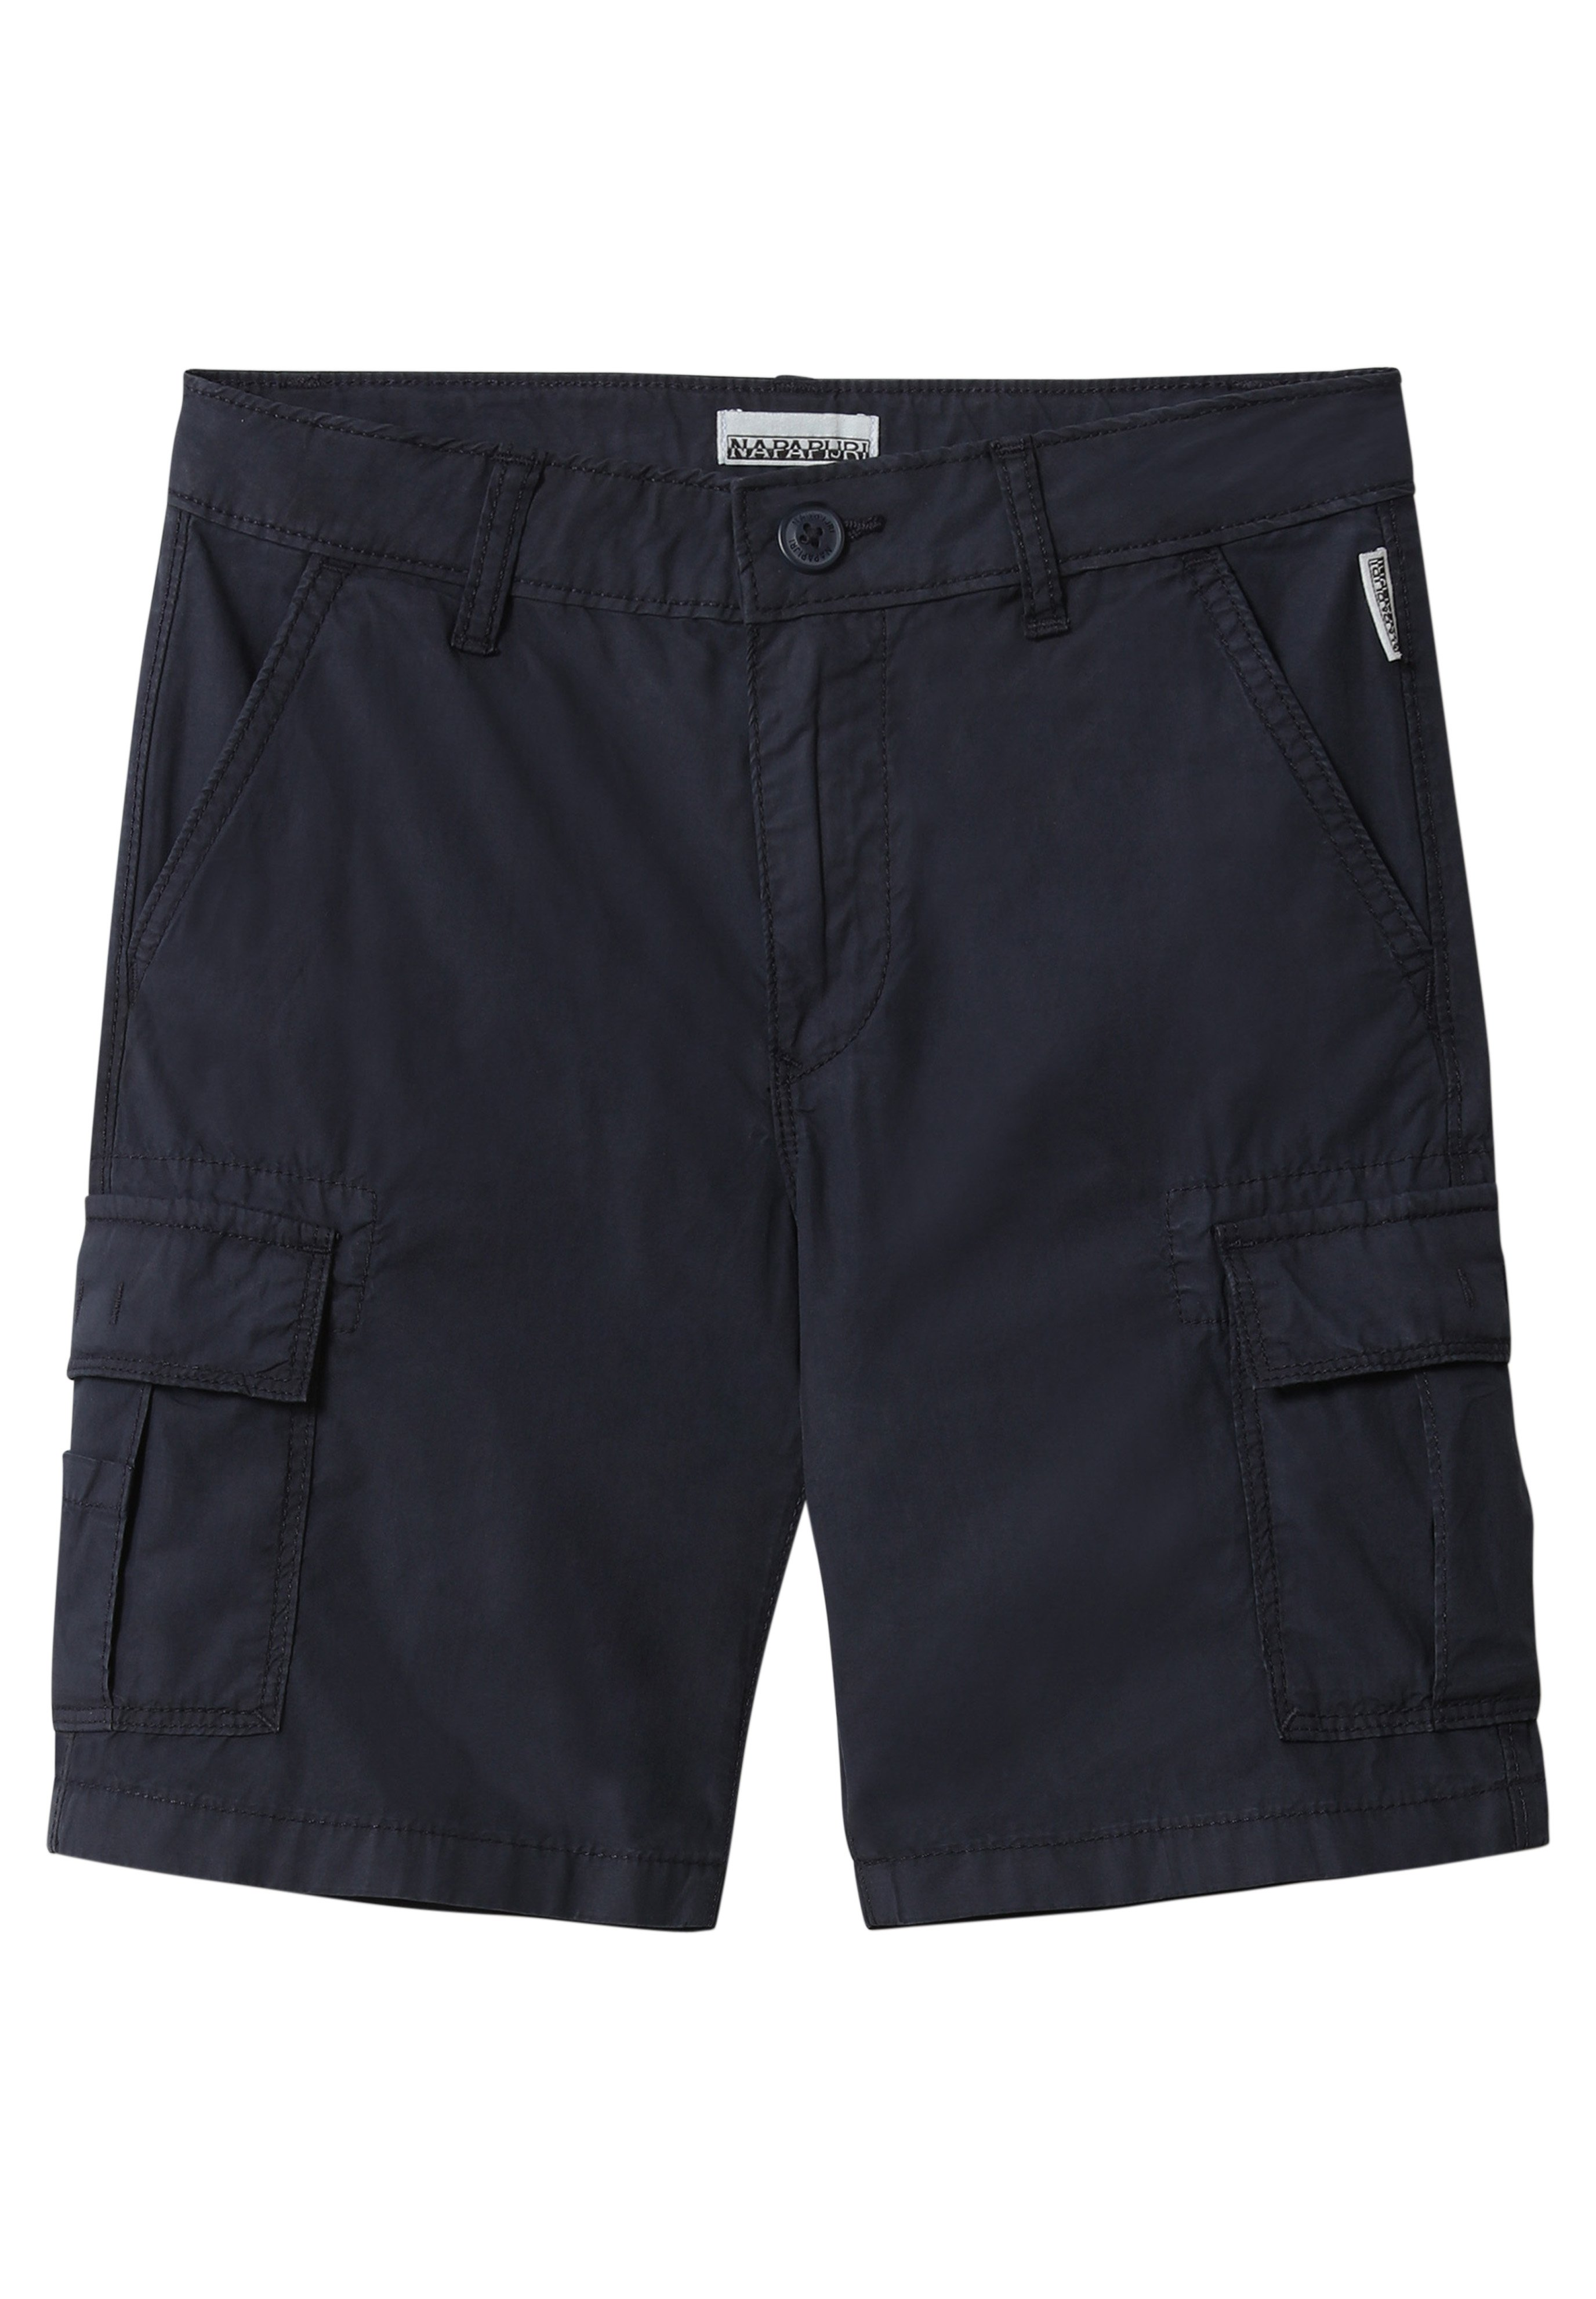 Enfant NOTO - Pantalon cargo